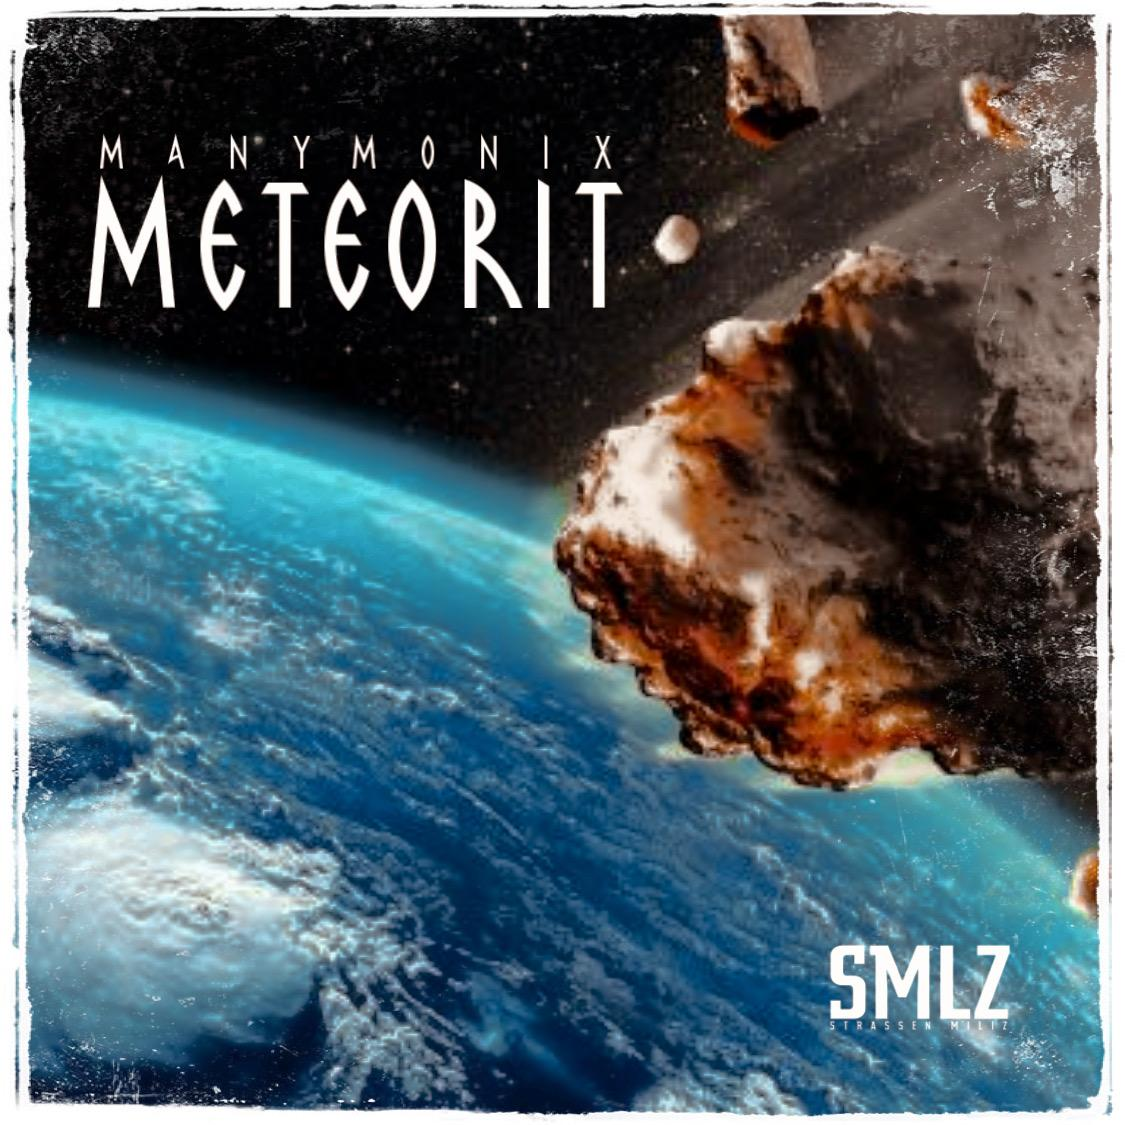 Upcoming: Manymonix - Meteorit (prod. By DC Beats)